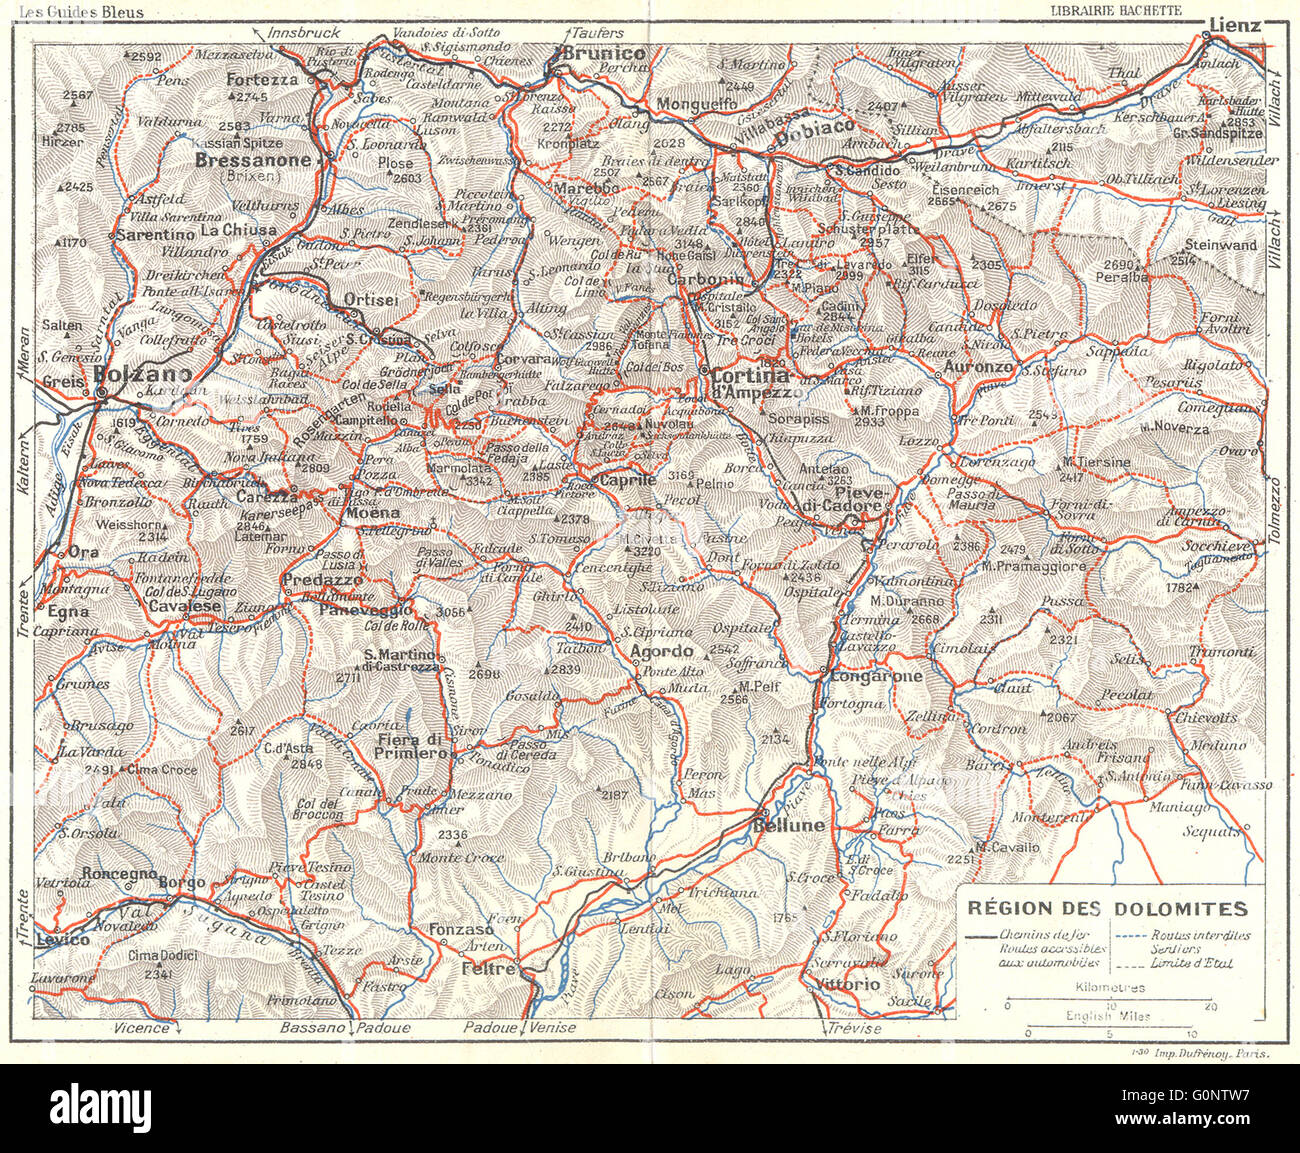 DOLOMITES Toblach Cortina DAmpezzo Region 1914 antique map Stock